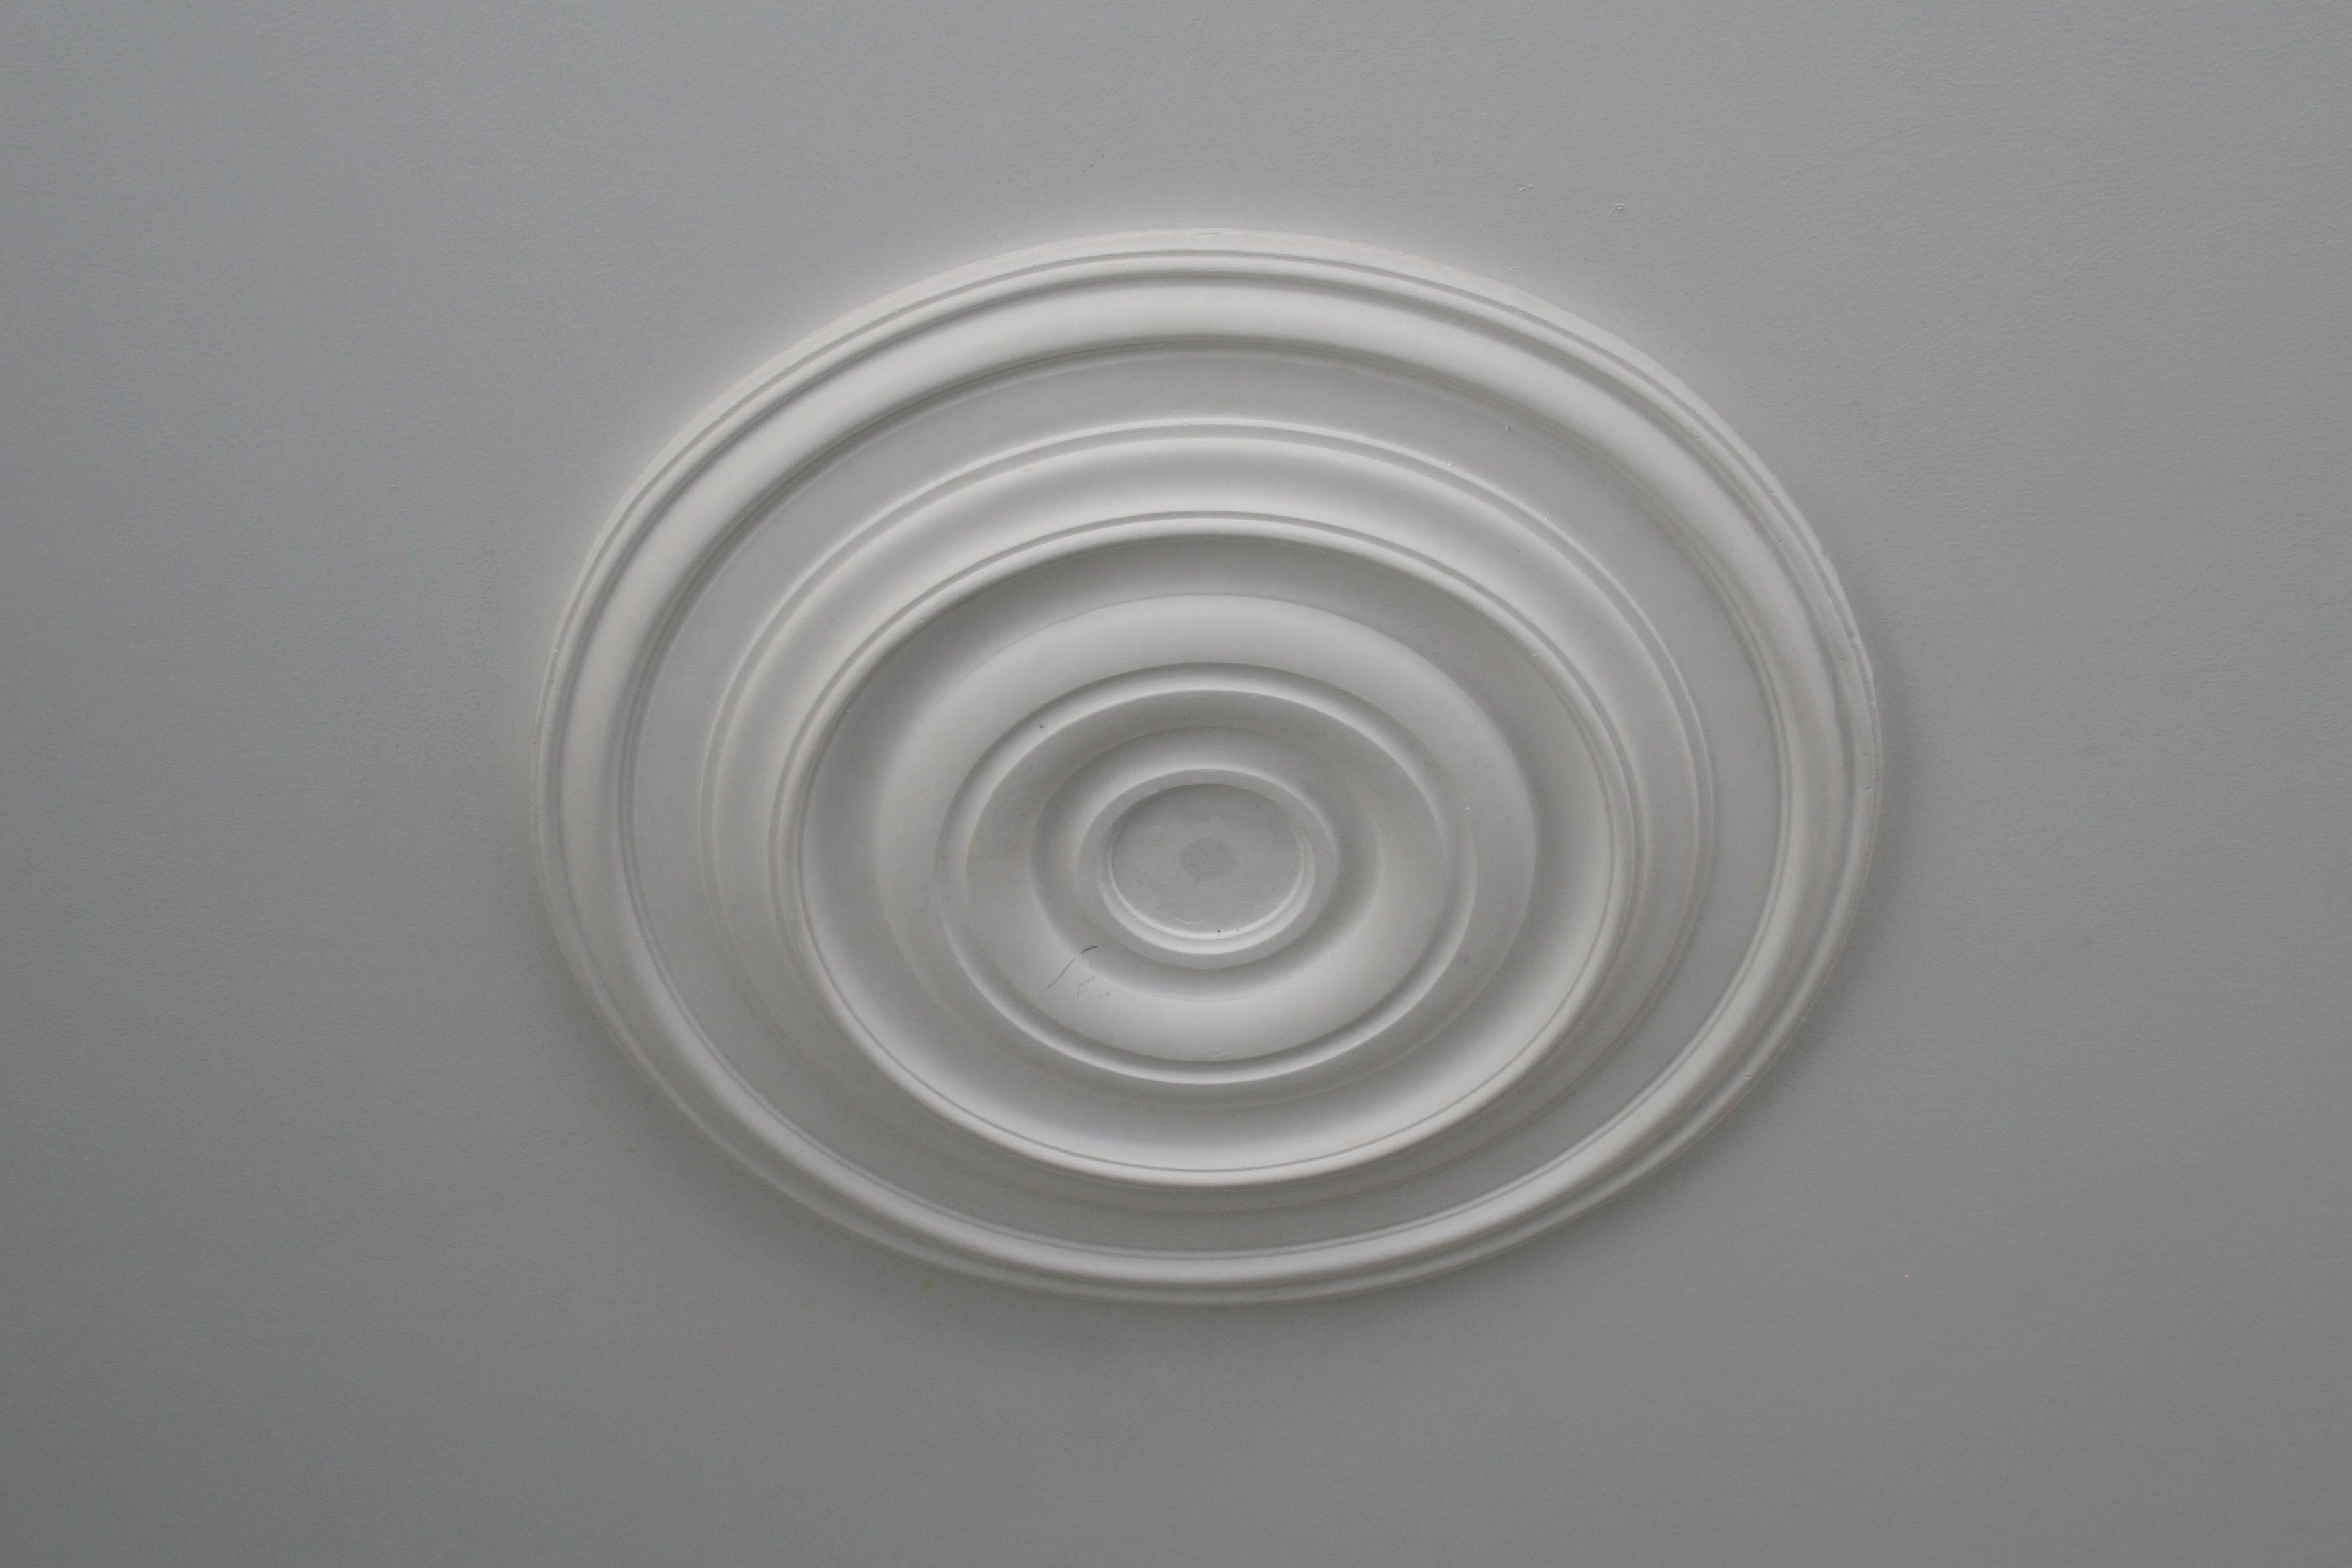 Rosace Plafond Moderne rosace r642 diam 55cm - gypsum art